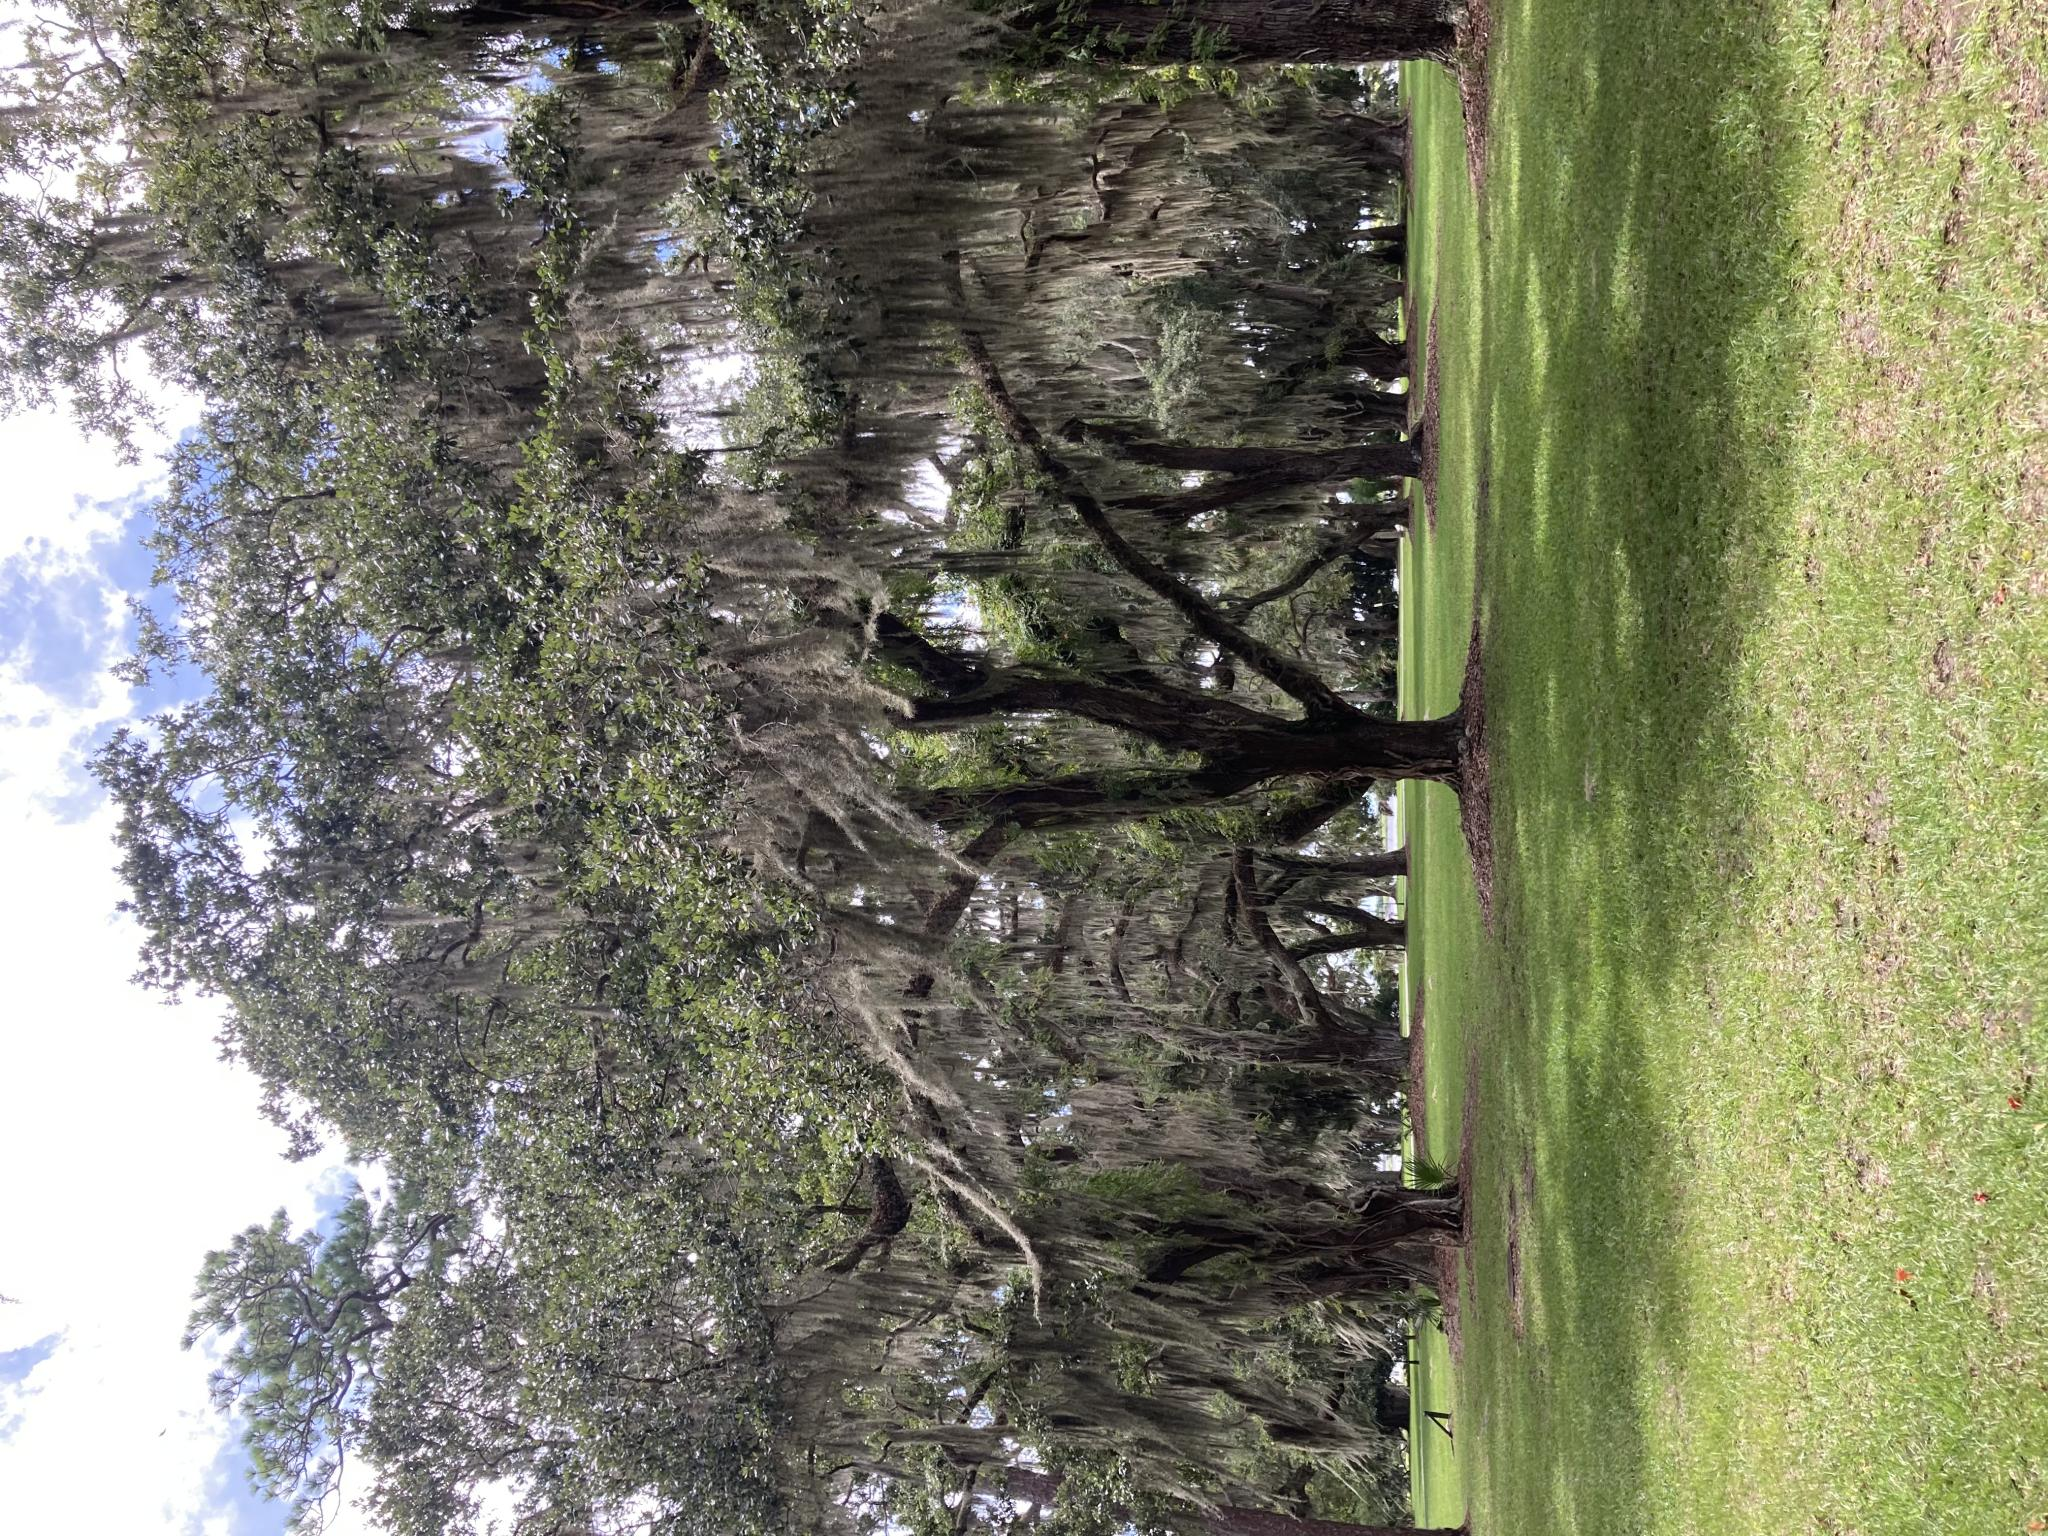 The Tree Hugging Thread-66b4ffcd-0e75-4616-9fe8-e1a22c03f4f1-jpg